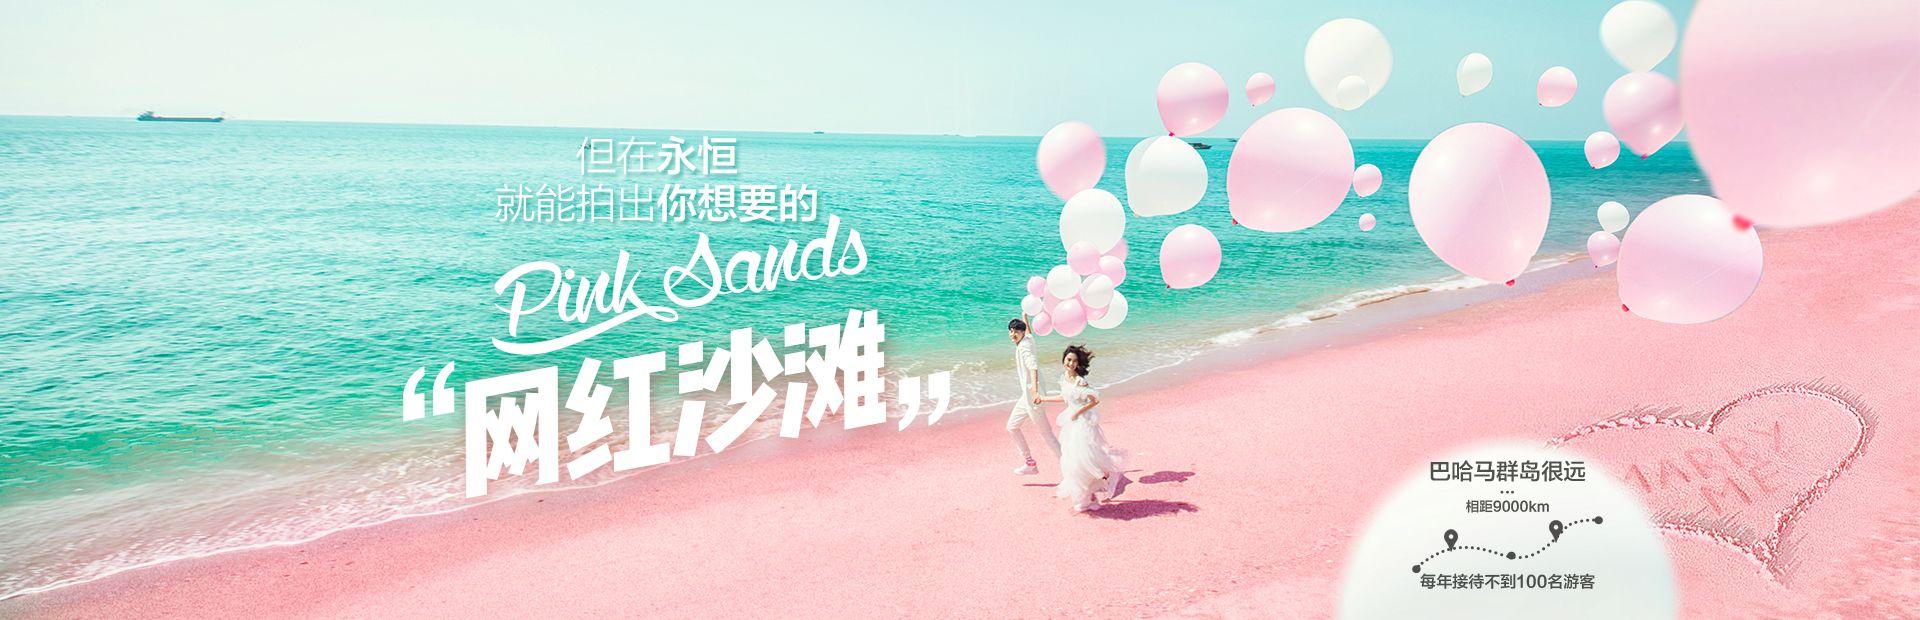 2018网红沙滩(顶部幻灯片)